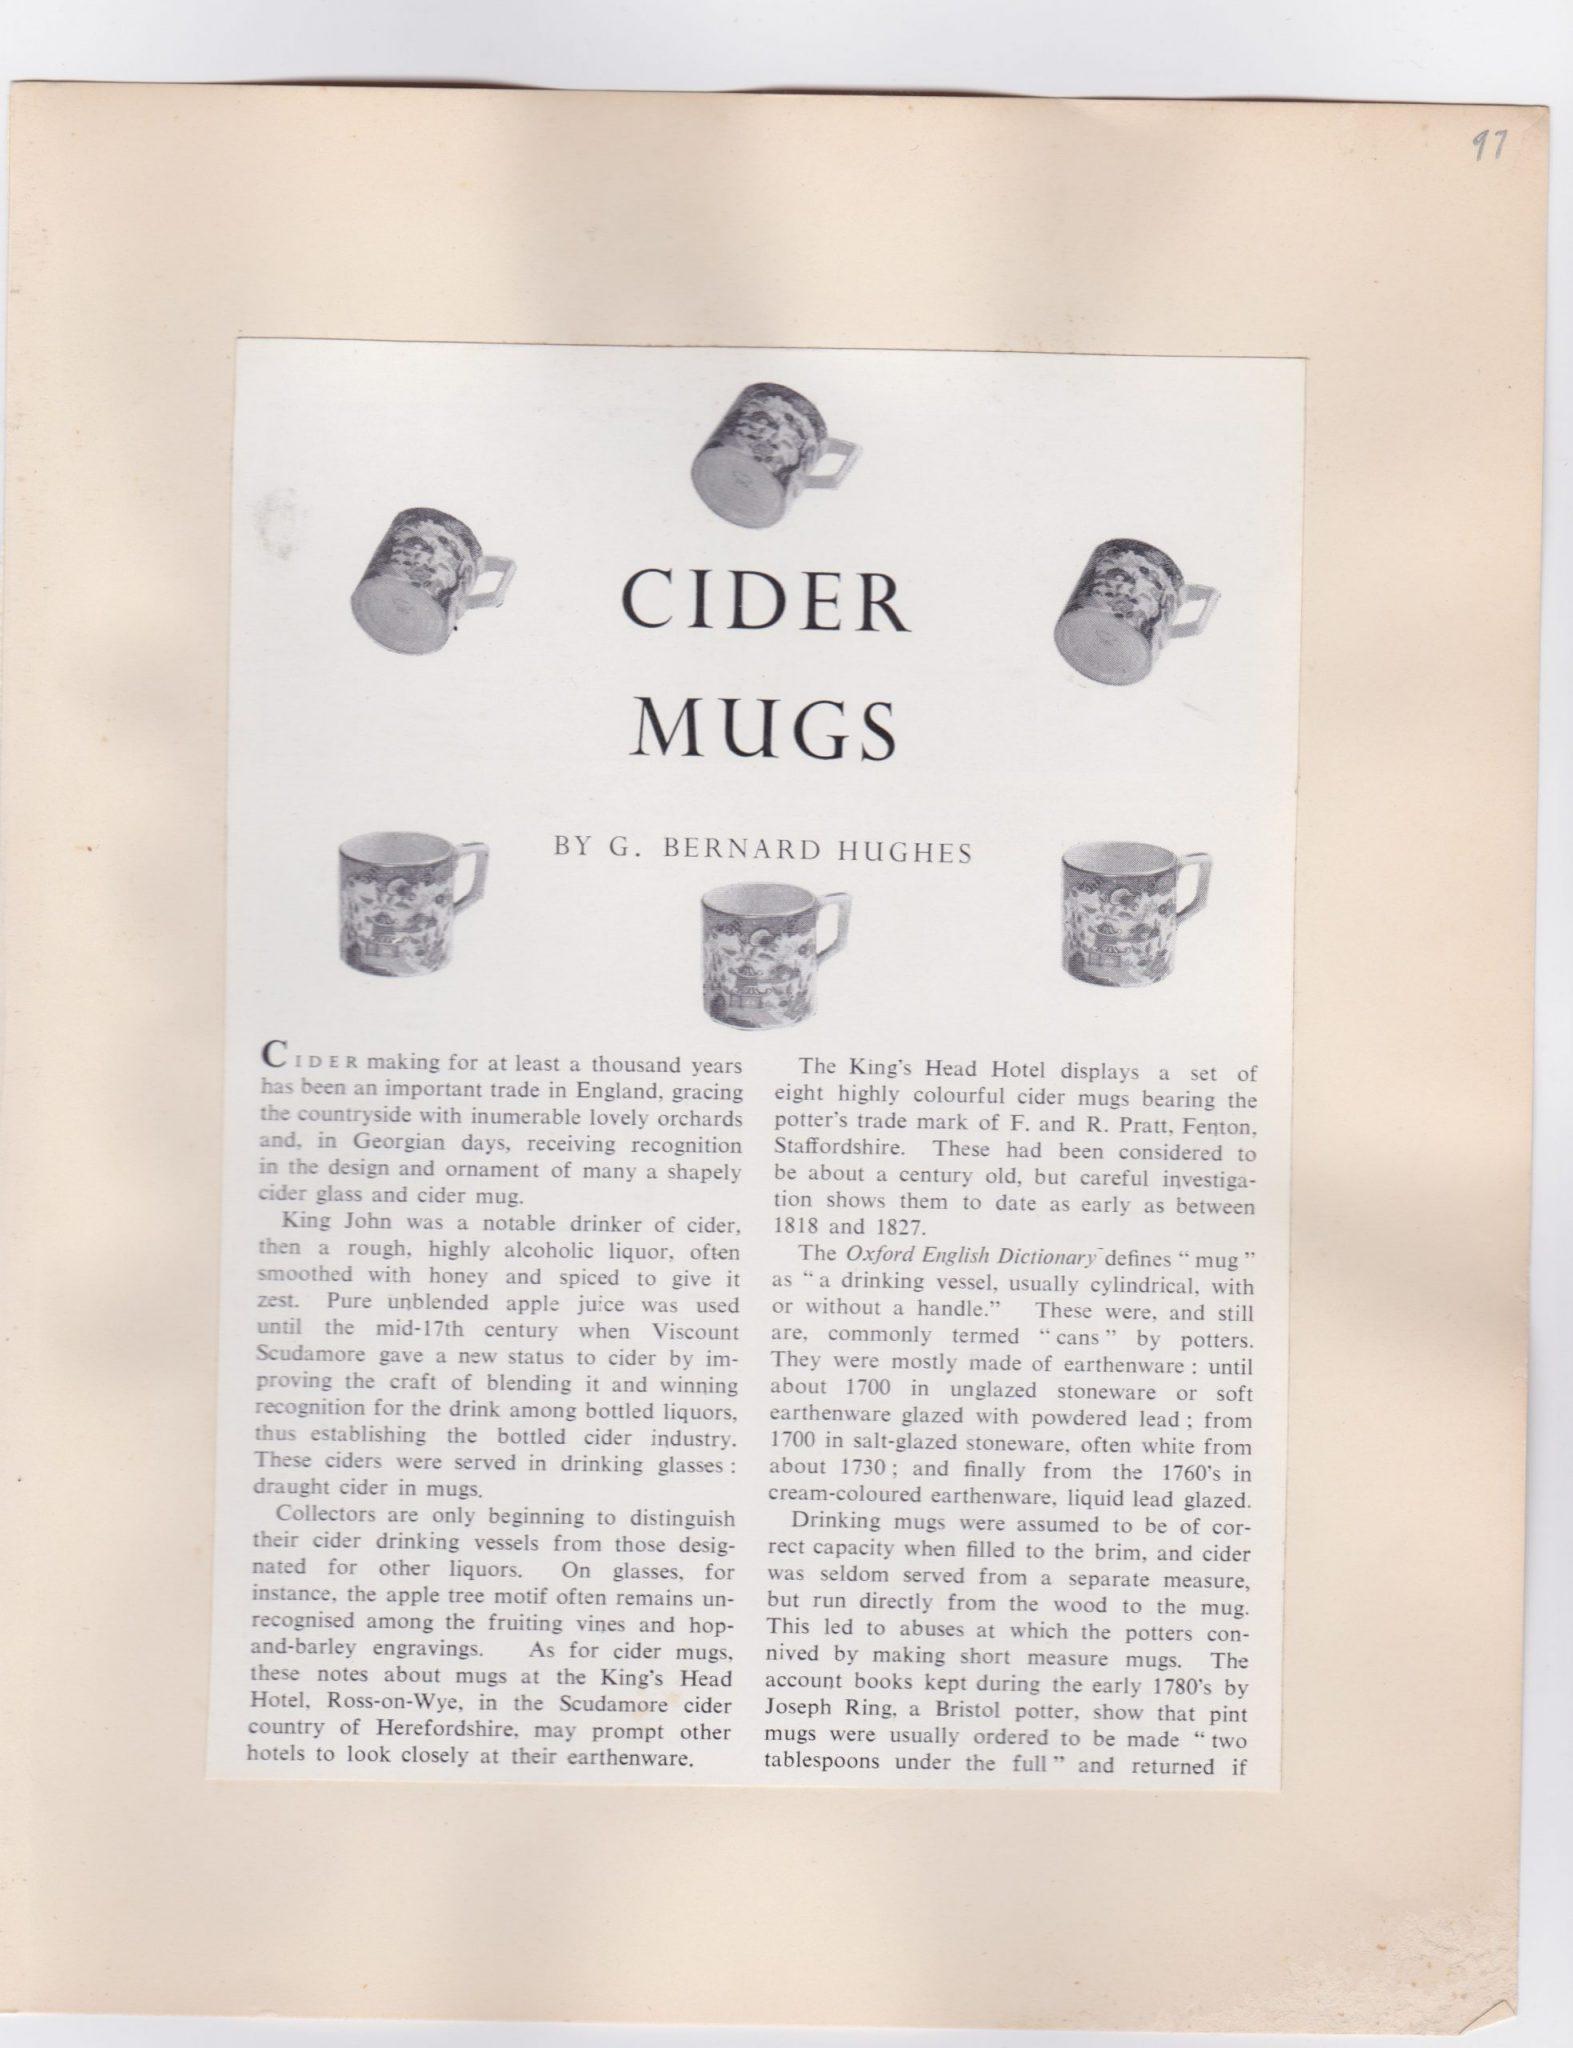 A Pub History Scrapbook Archive 41